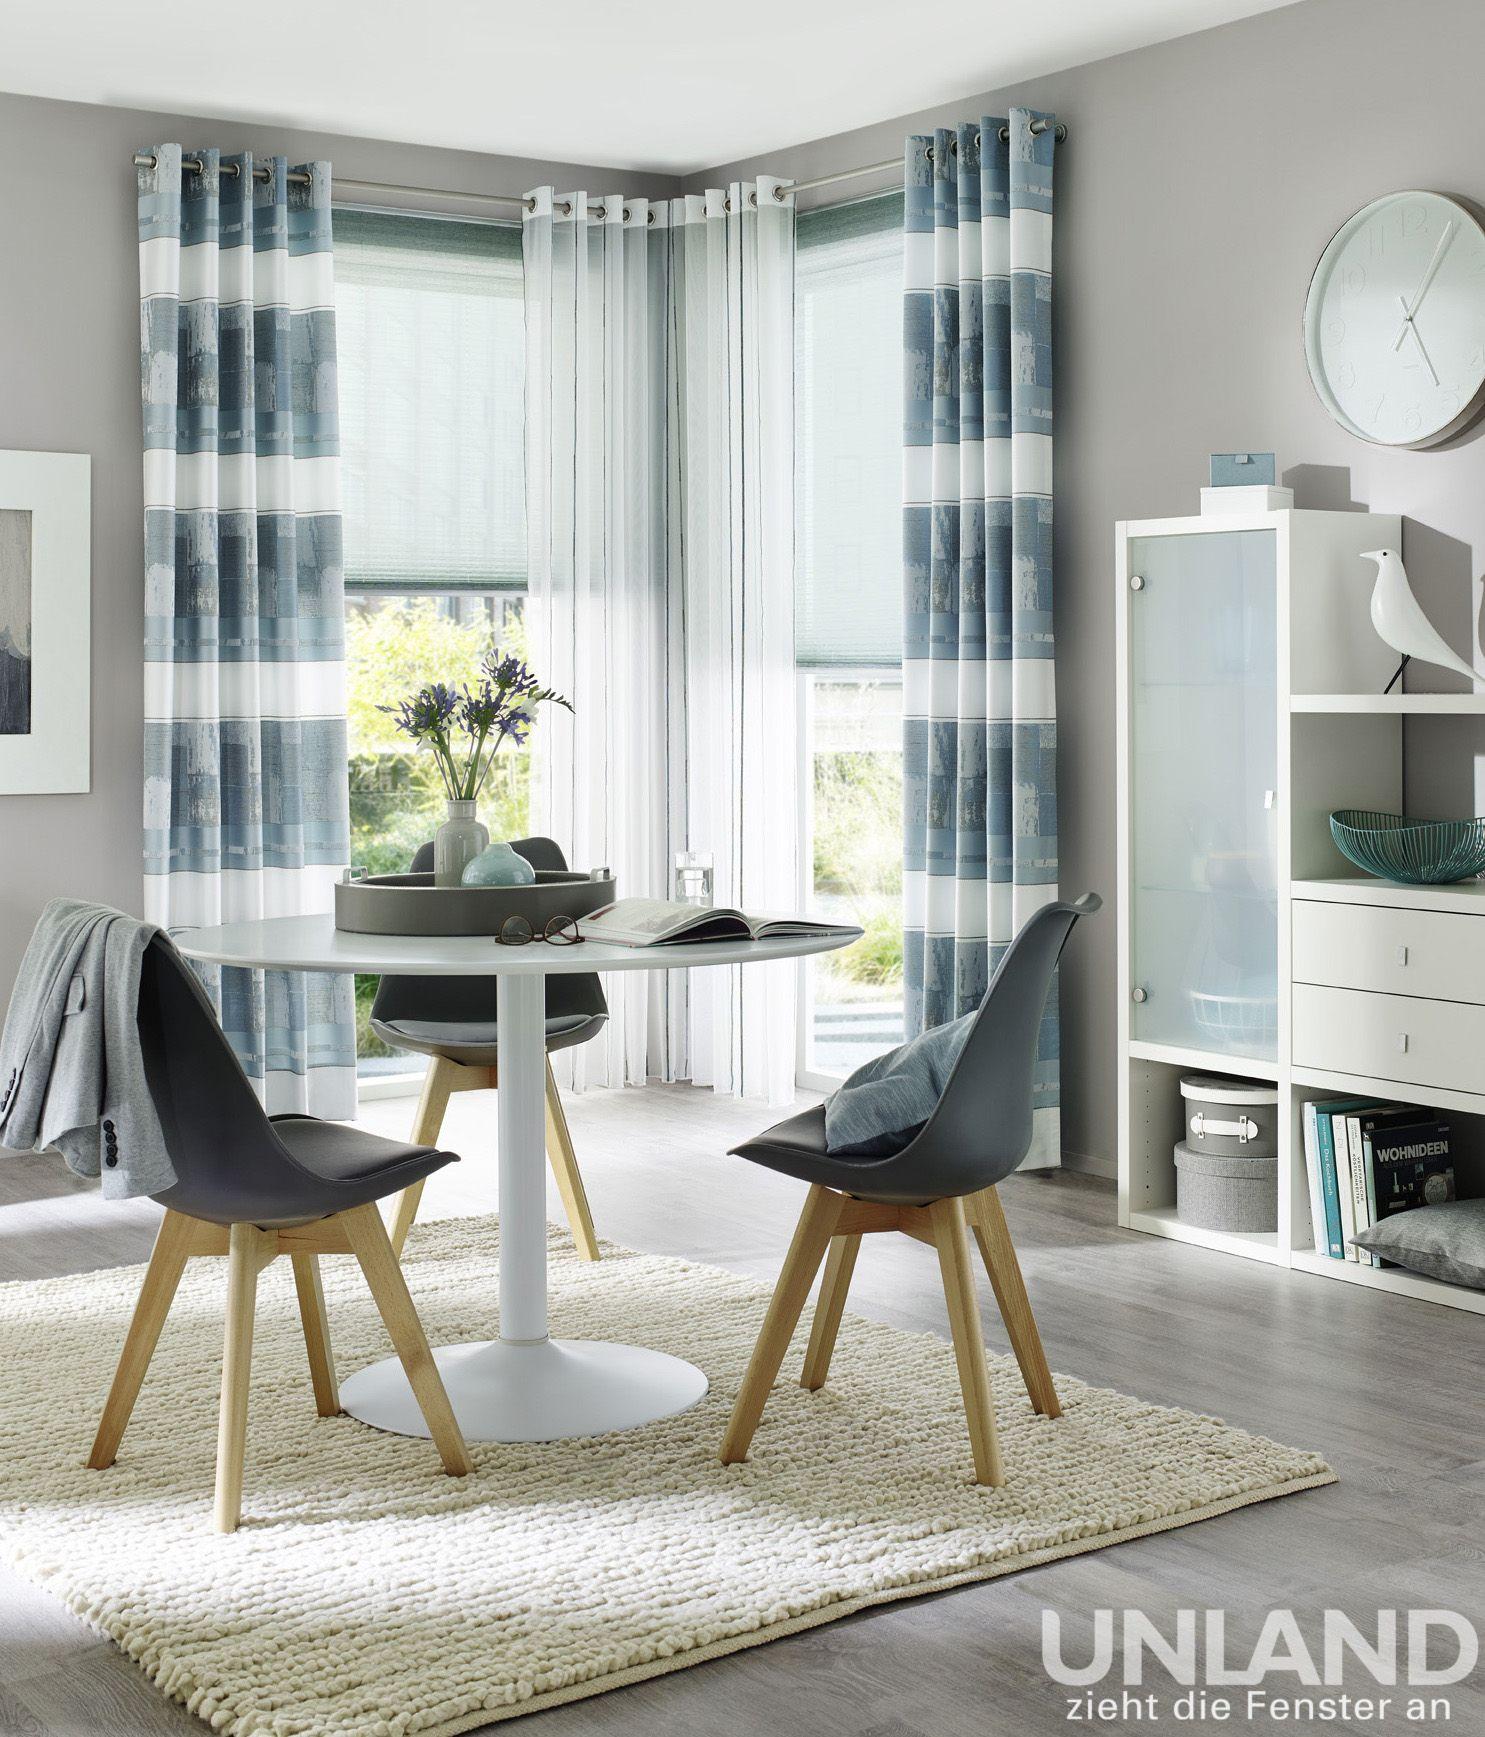 fenster boston gardinen dekostoffe vorhang wohnstoffe plissees rollos jalousien. Black Bedroom Furniture Sets. Home Design Ideas